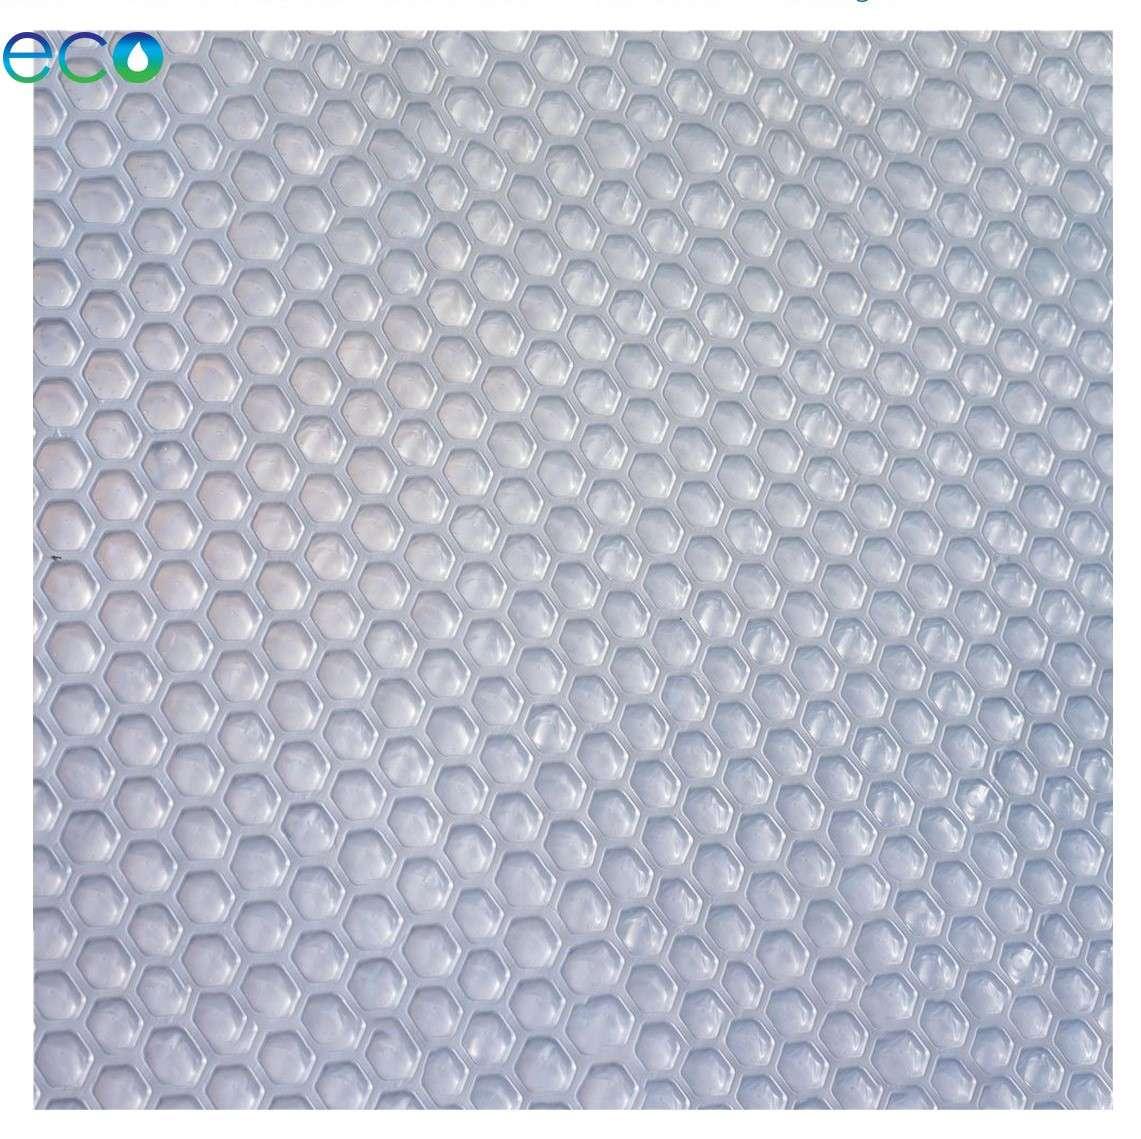 Pool Supply World Velox Silver Solar Cover